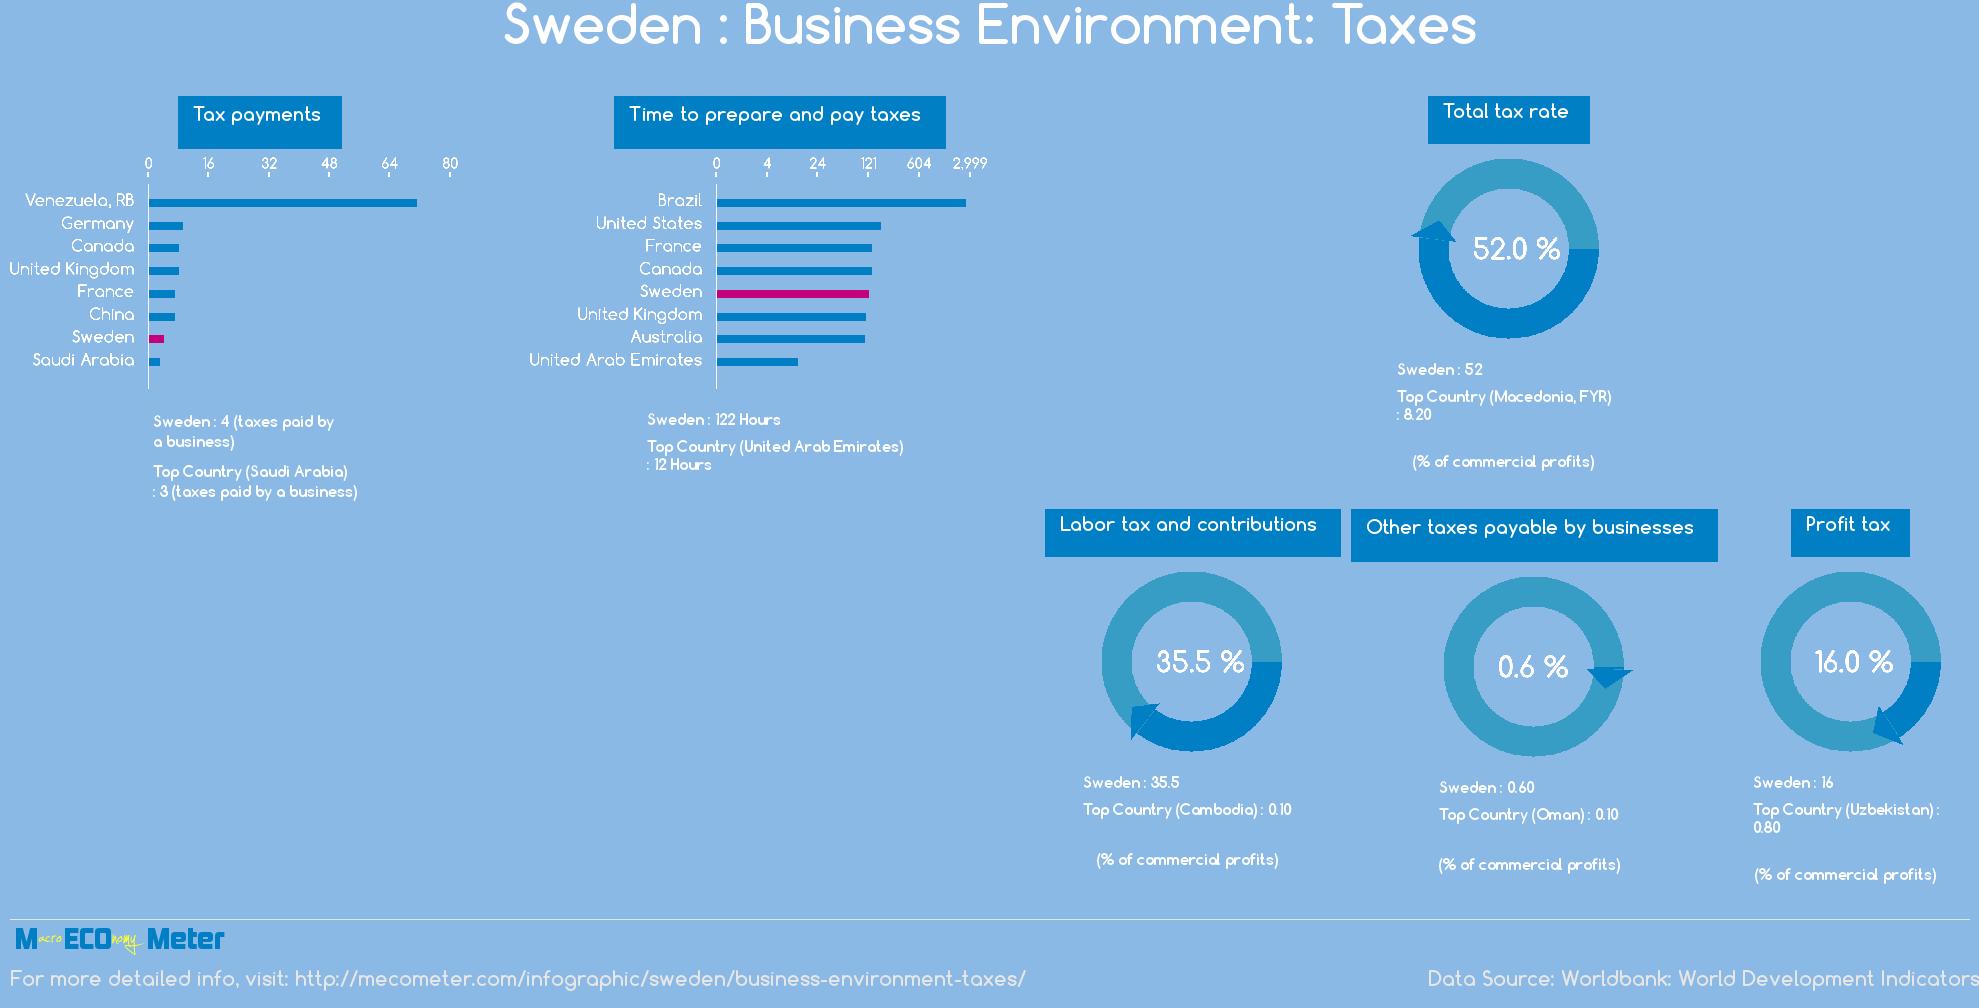 Sweden : Business Environment: Taxes